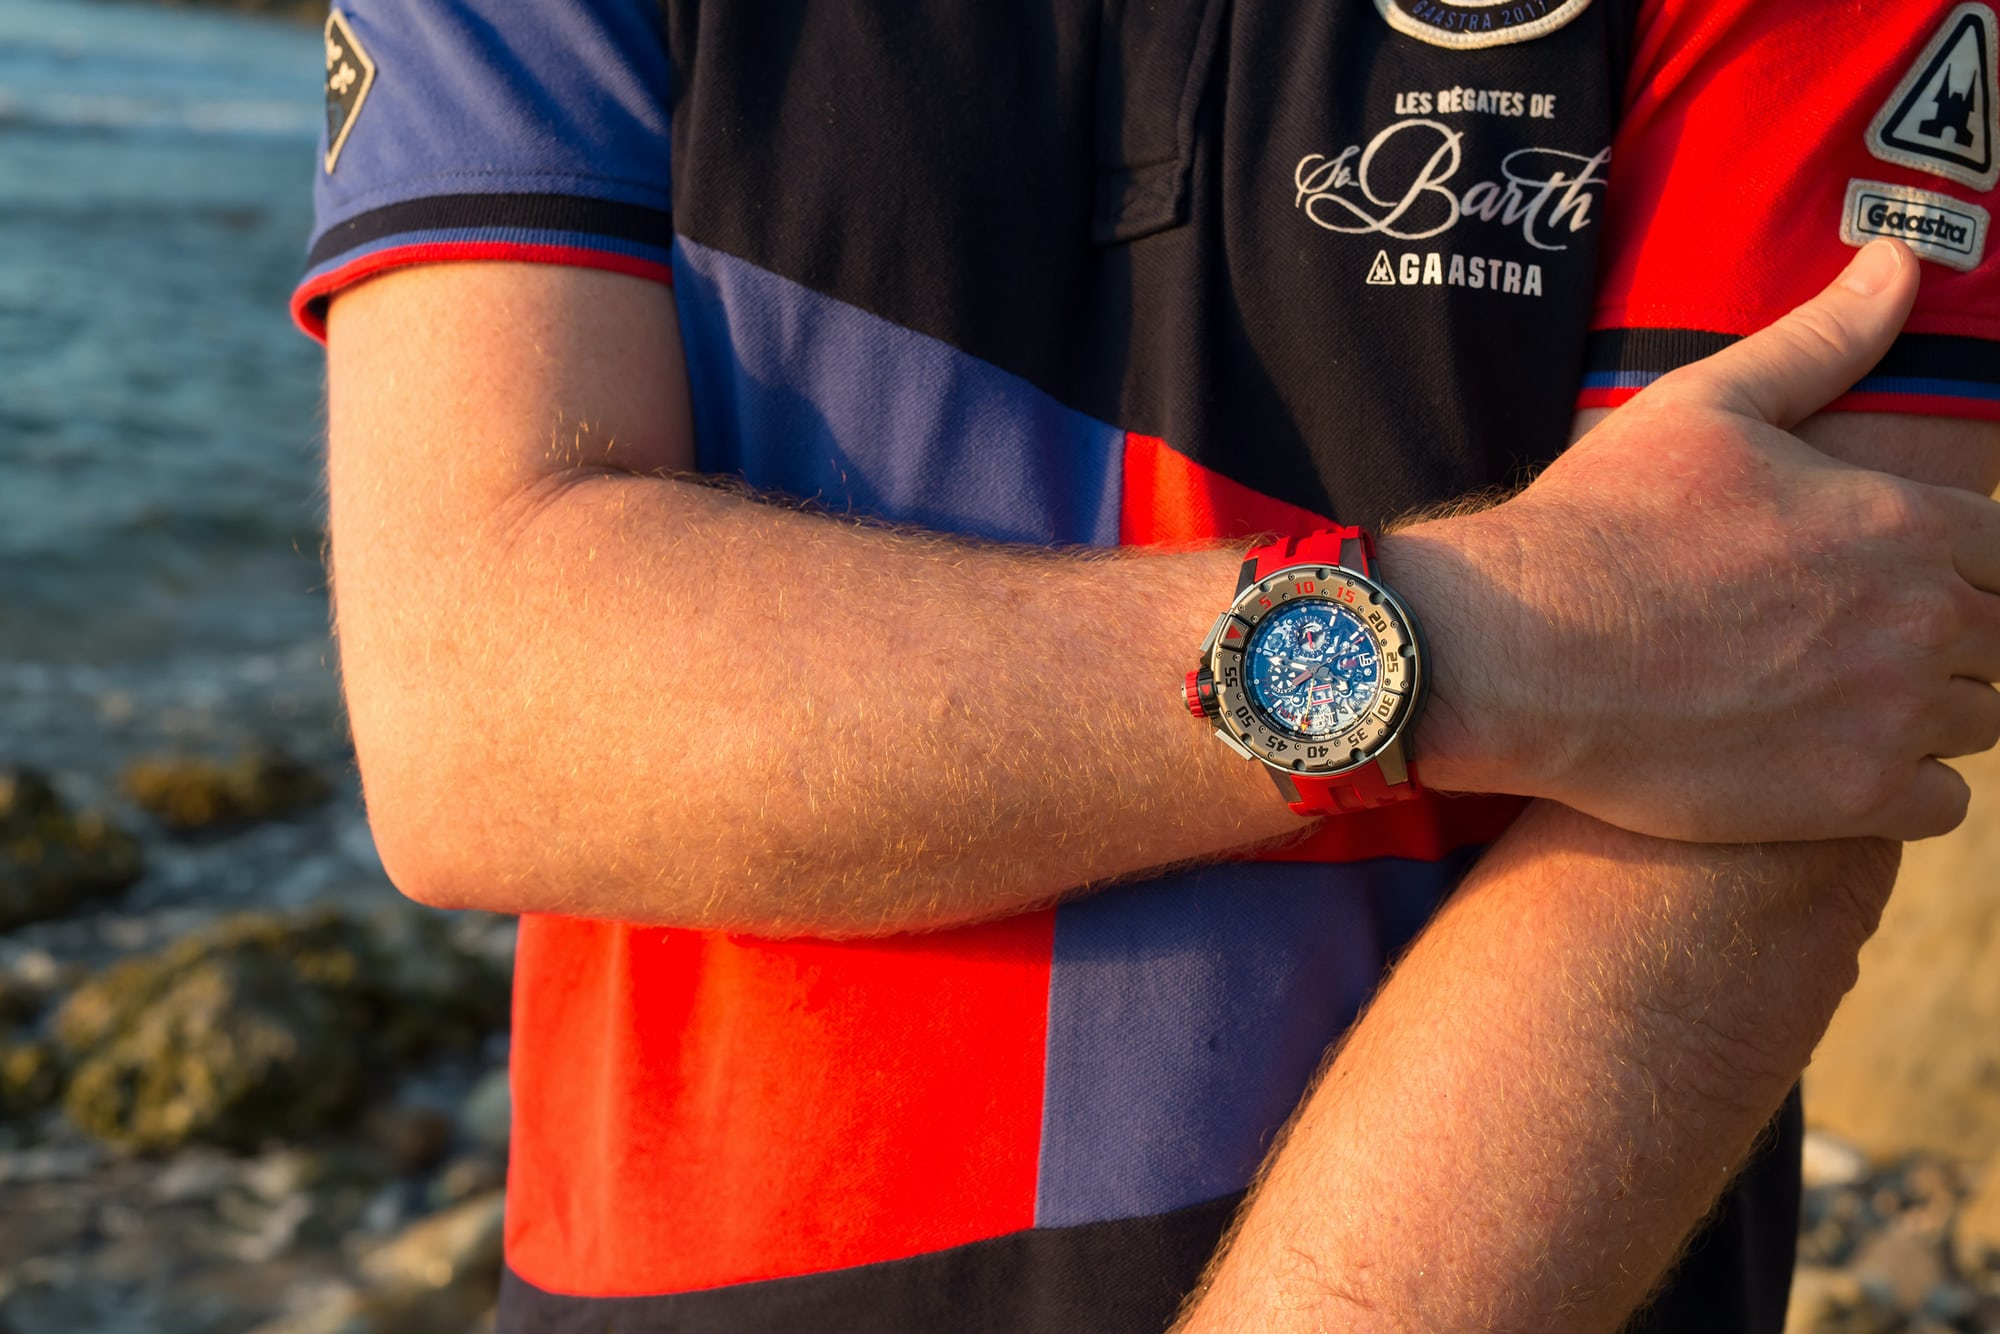 richard mille RM 032 wristshot Hands-On: The Richard Mille RM 032 Diver Flyback Chronograph Hands-On: The Richard Mille RM 032 Diver Flyback Chronograph RM032 11